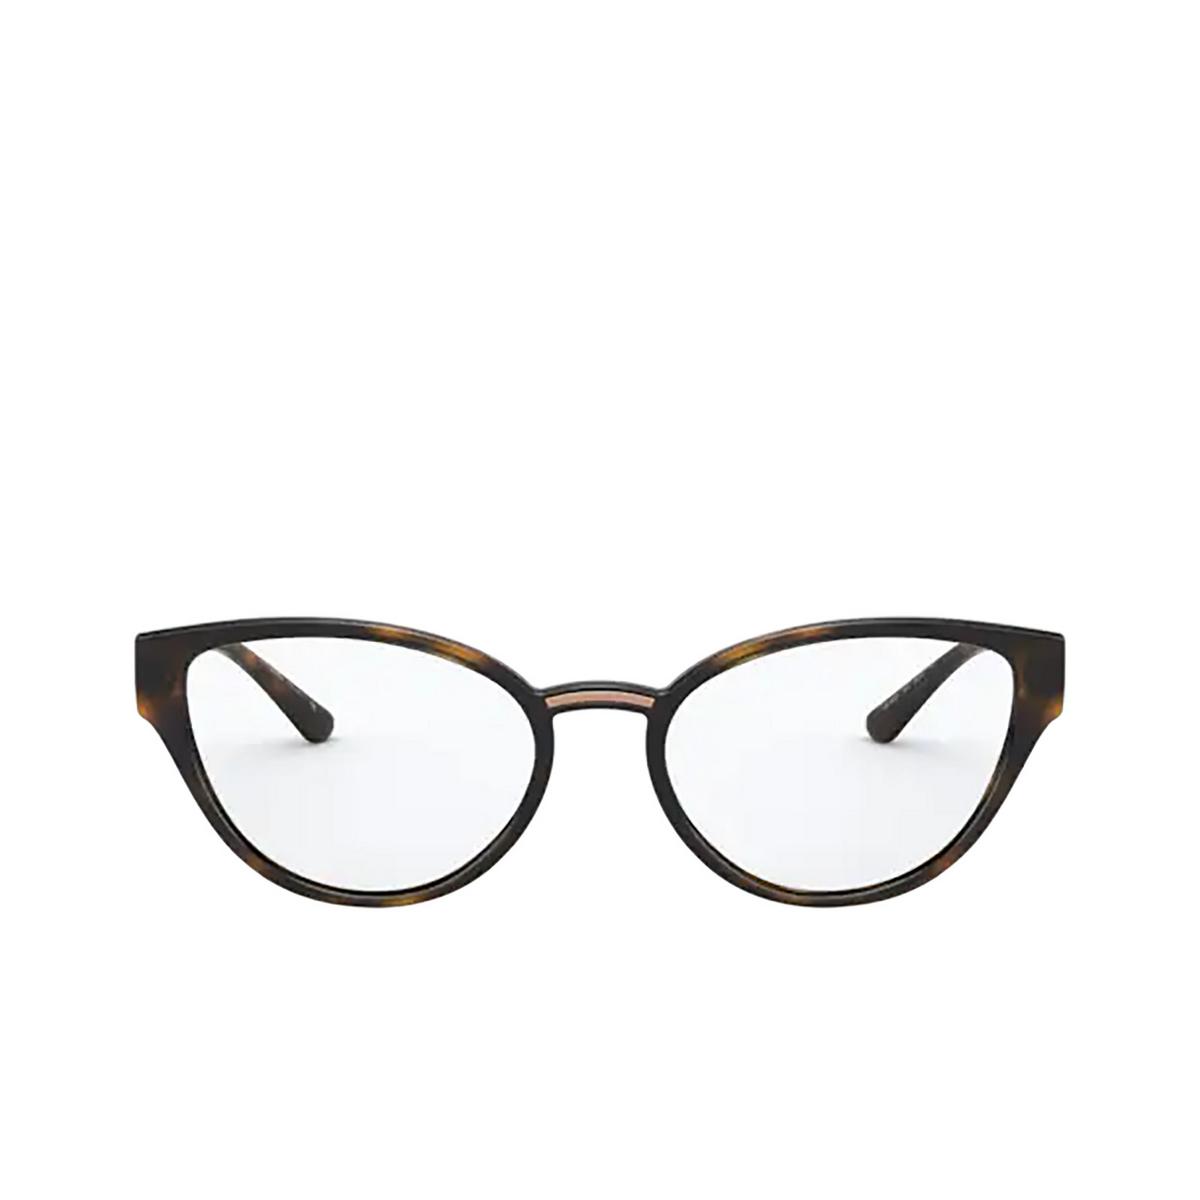 Dolce & Gabbana® Cat-eye Eyeglasses: DG5055 color Havana 502 - front view.